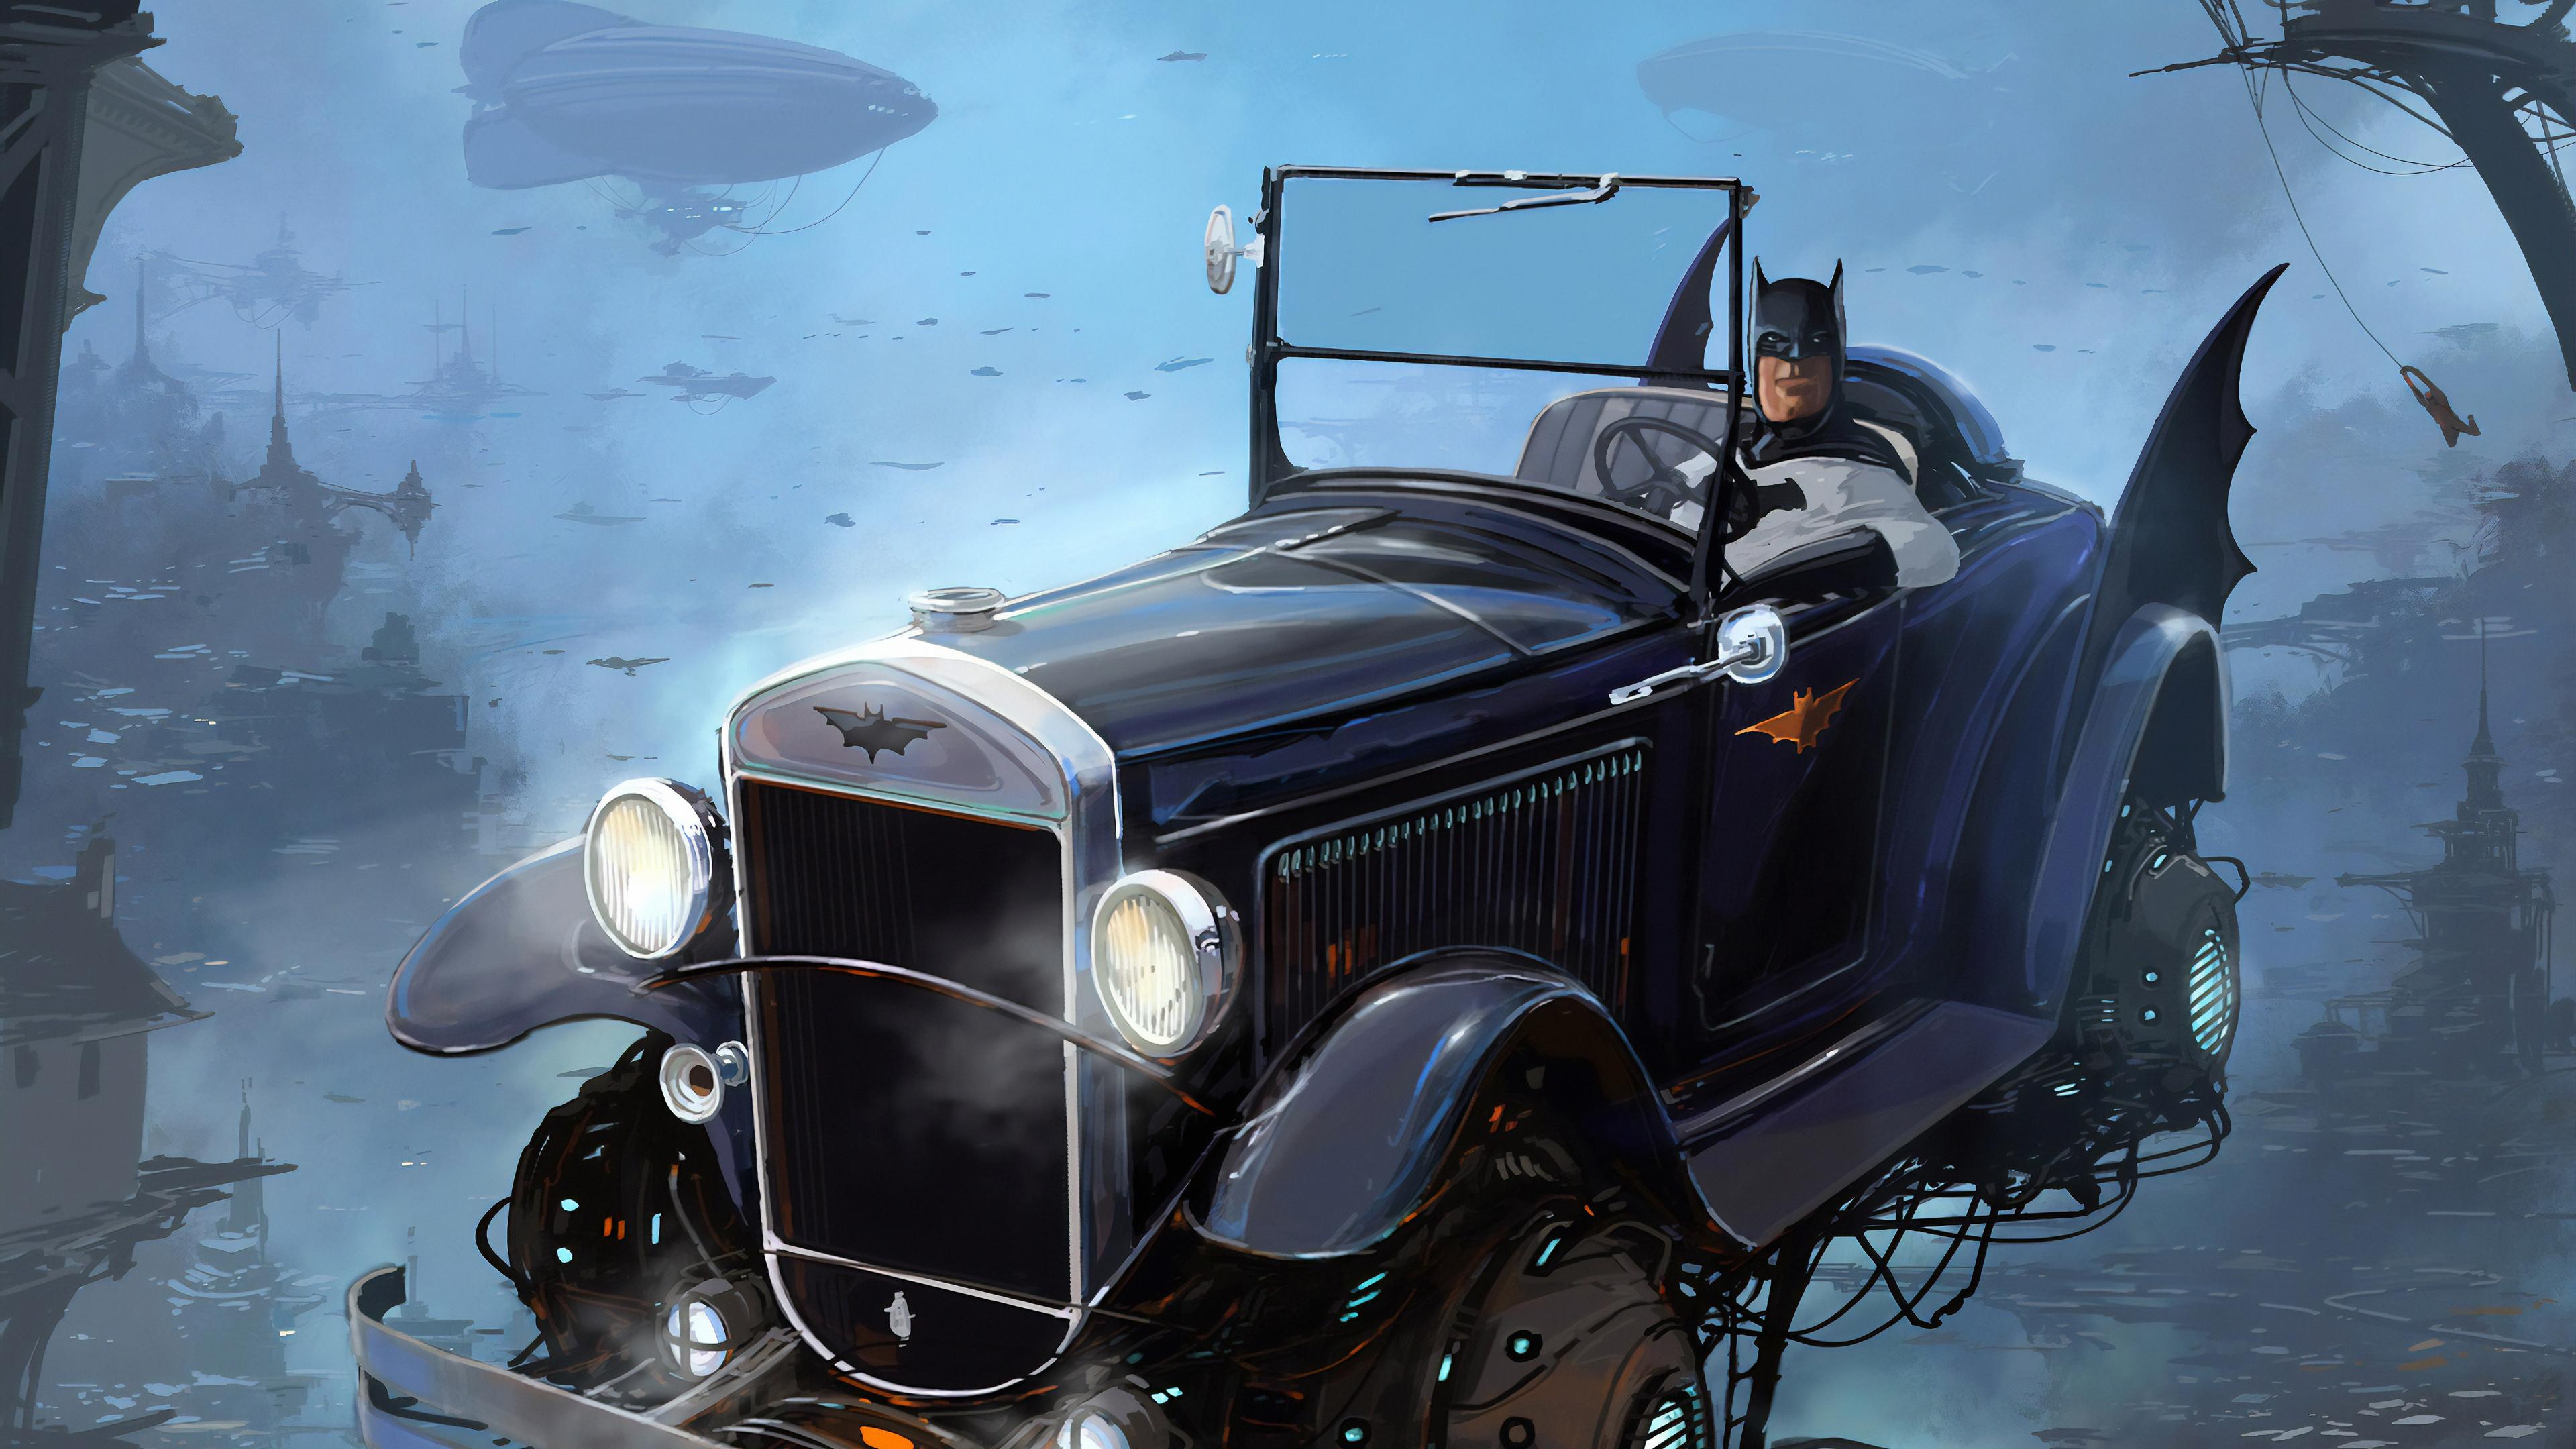 batman vehicle 1570394574 - Batman Vehicle - superheroes wallpapers, hd-wallpapers, digital art wallpapers, batman wallpapers, artwork wallpapers, artstation wallpapers, 4k-wallpapers